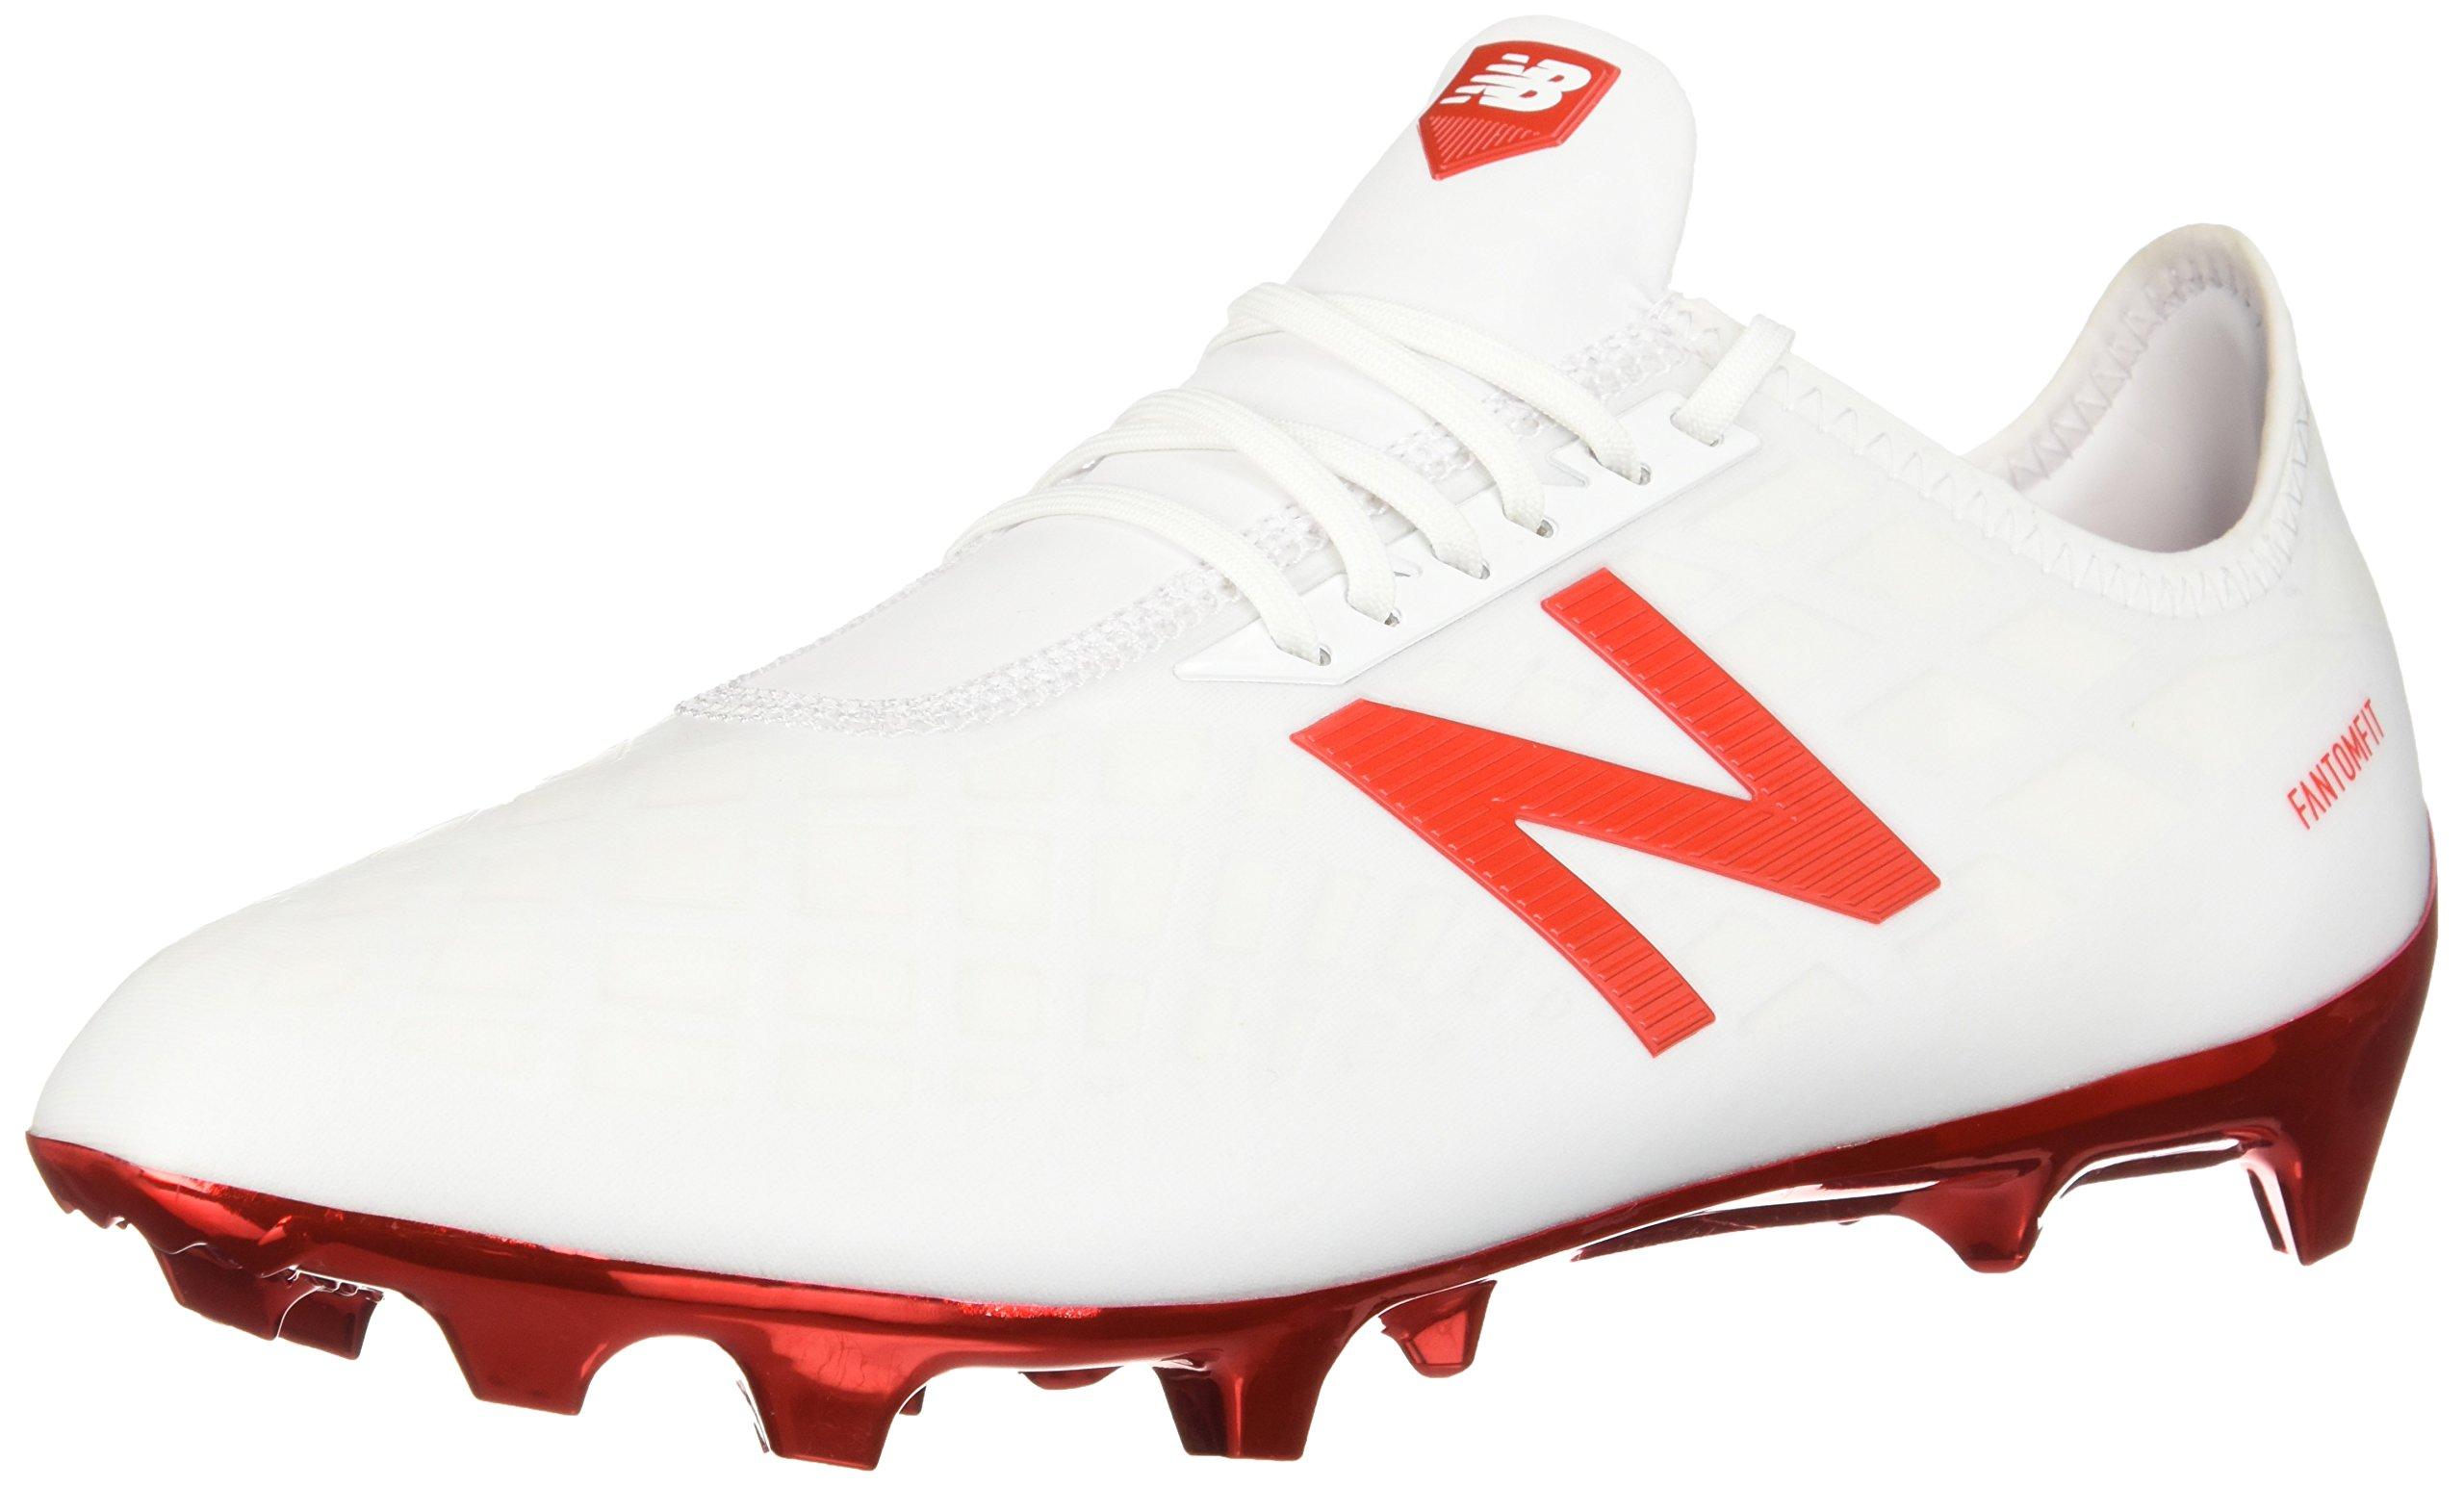 New Balance Men's Furon 4.0 Pro FG Soccer Shoe, White/Flame Orange, 13.5 D US